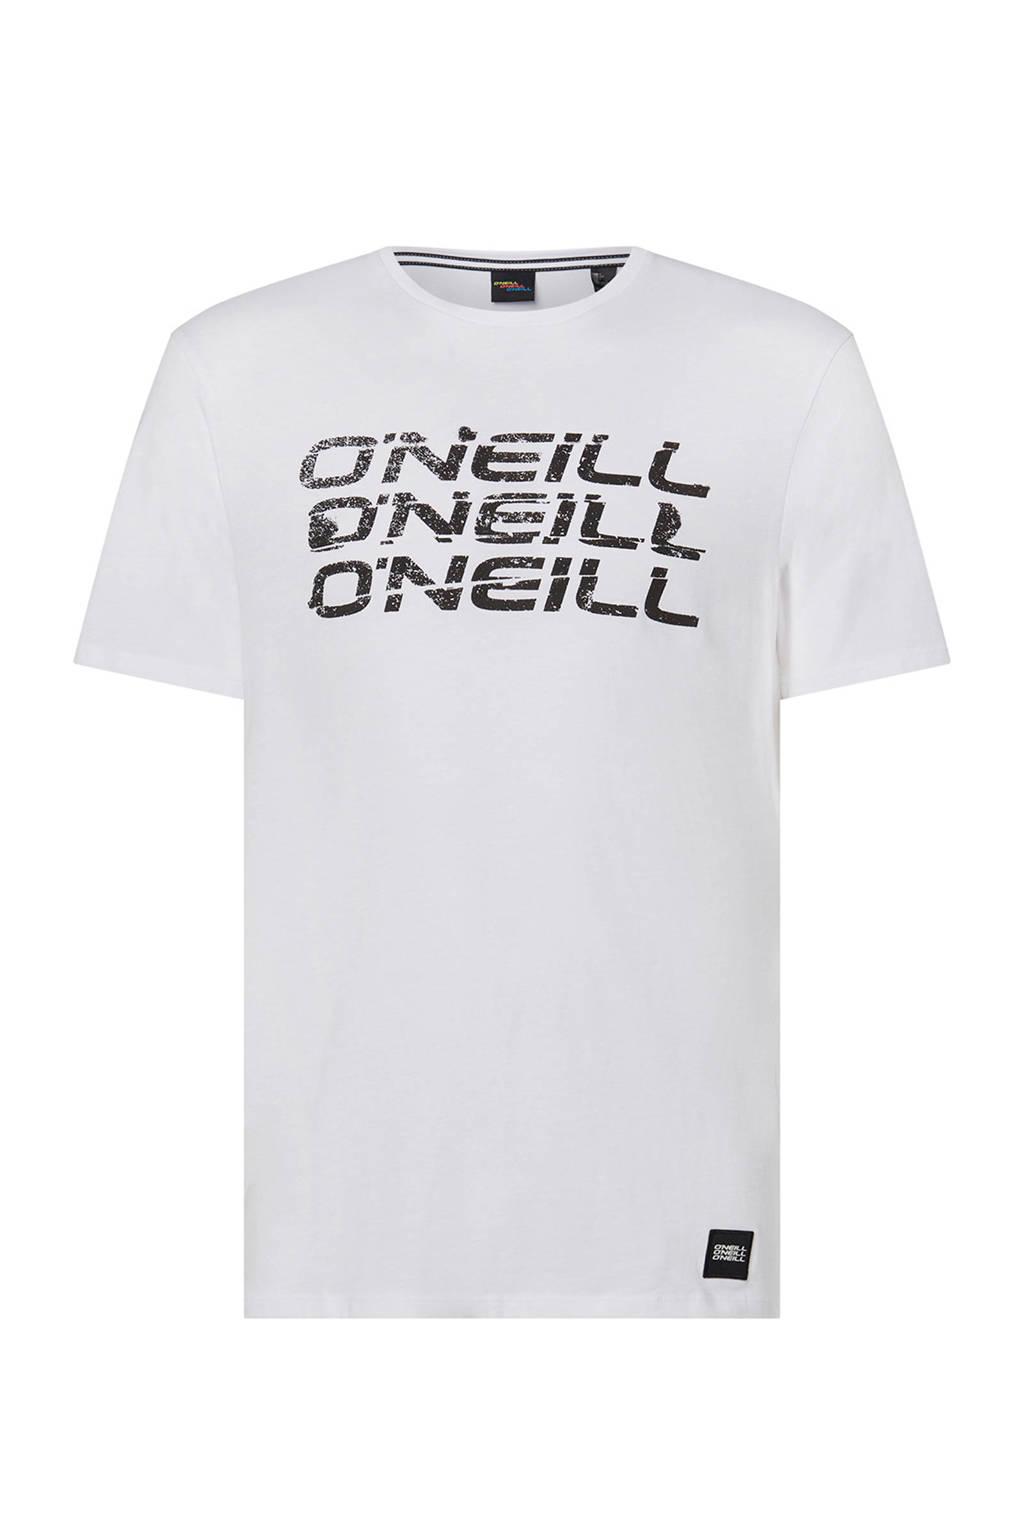 O'Neill T-shirt met logo white uni, White Uni